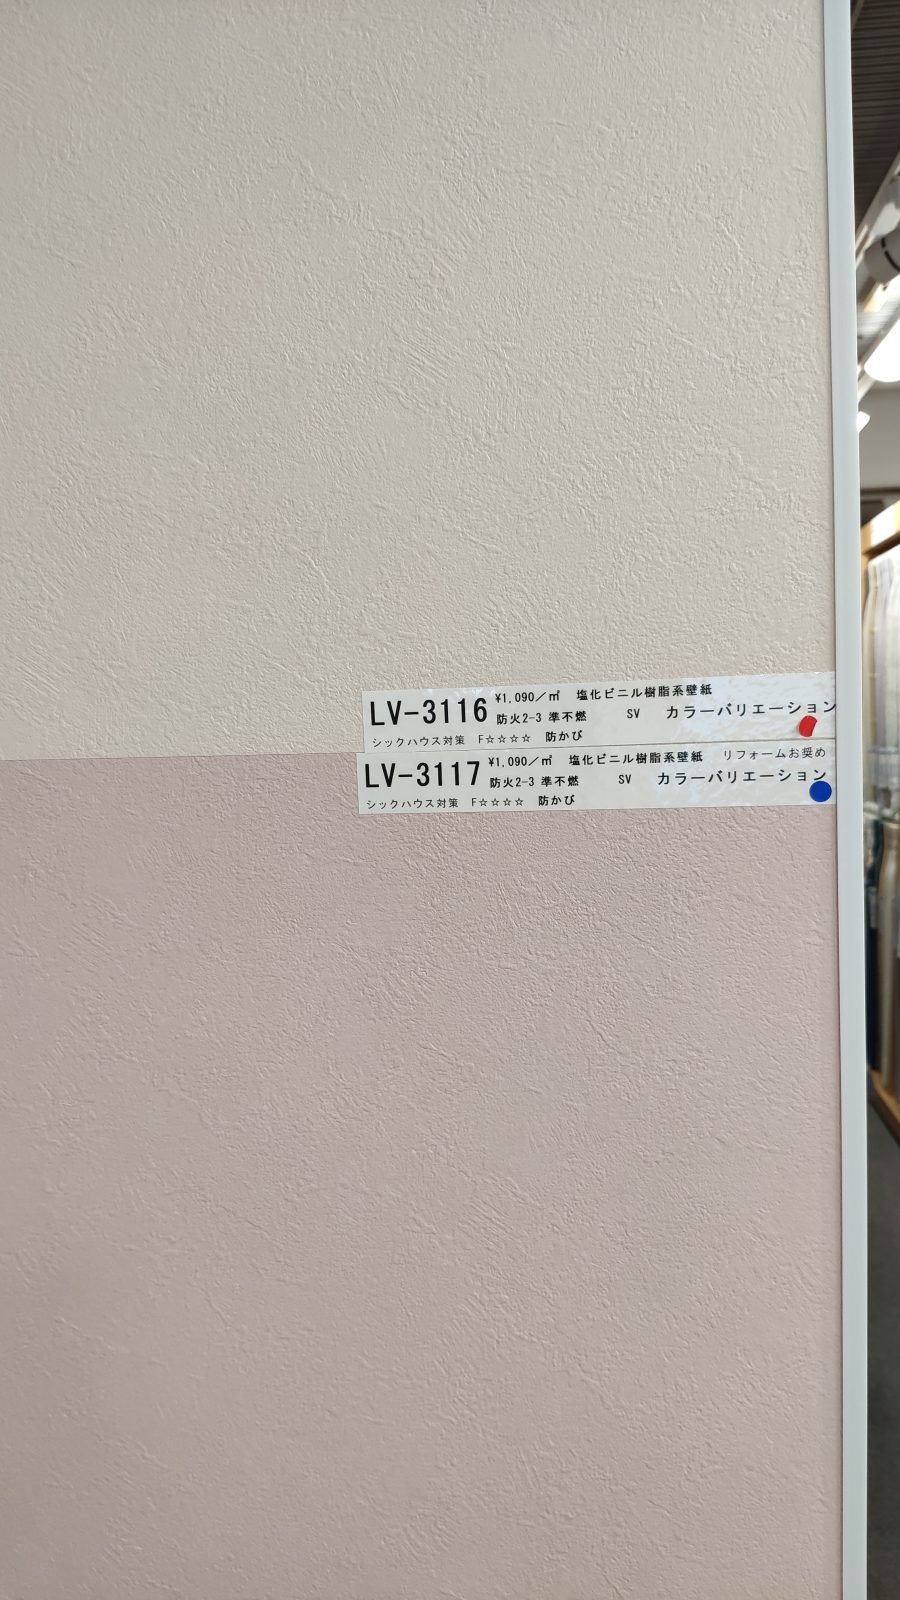 LV-3116 / LV-3117(LTS409)